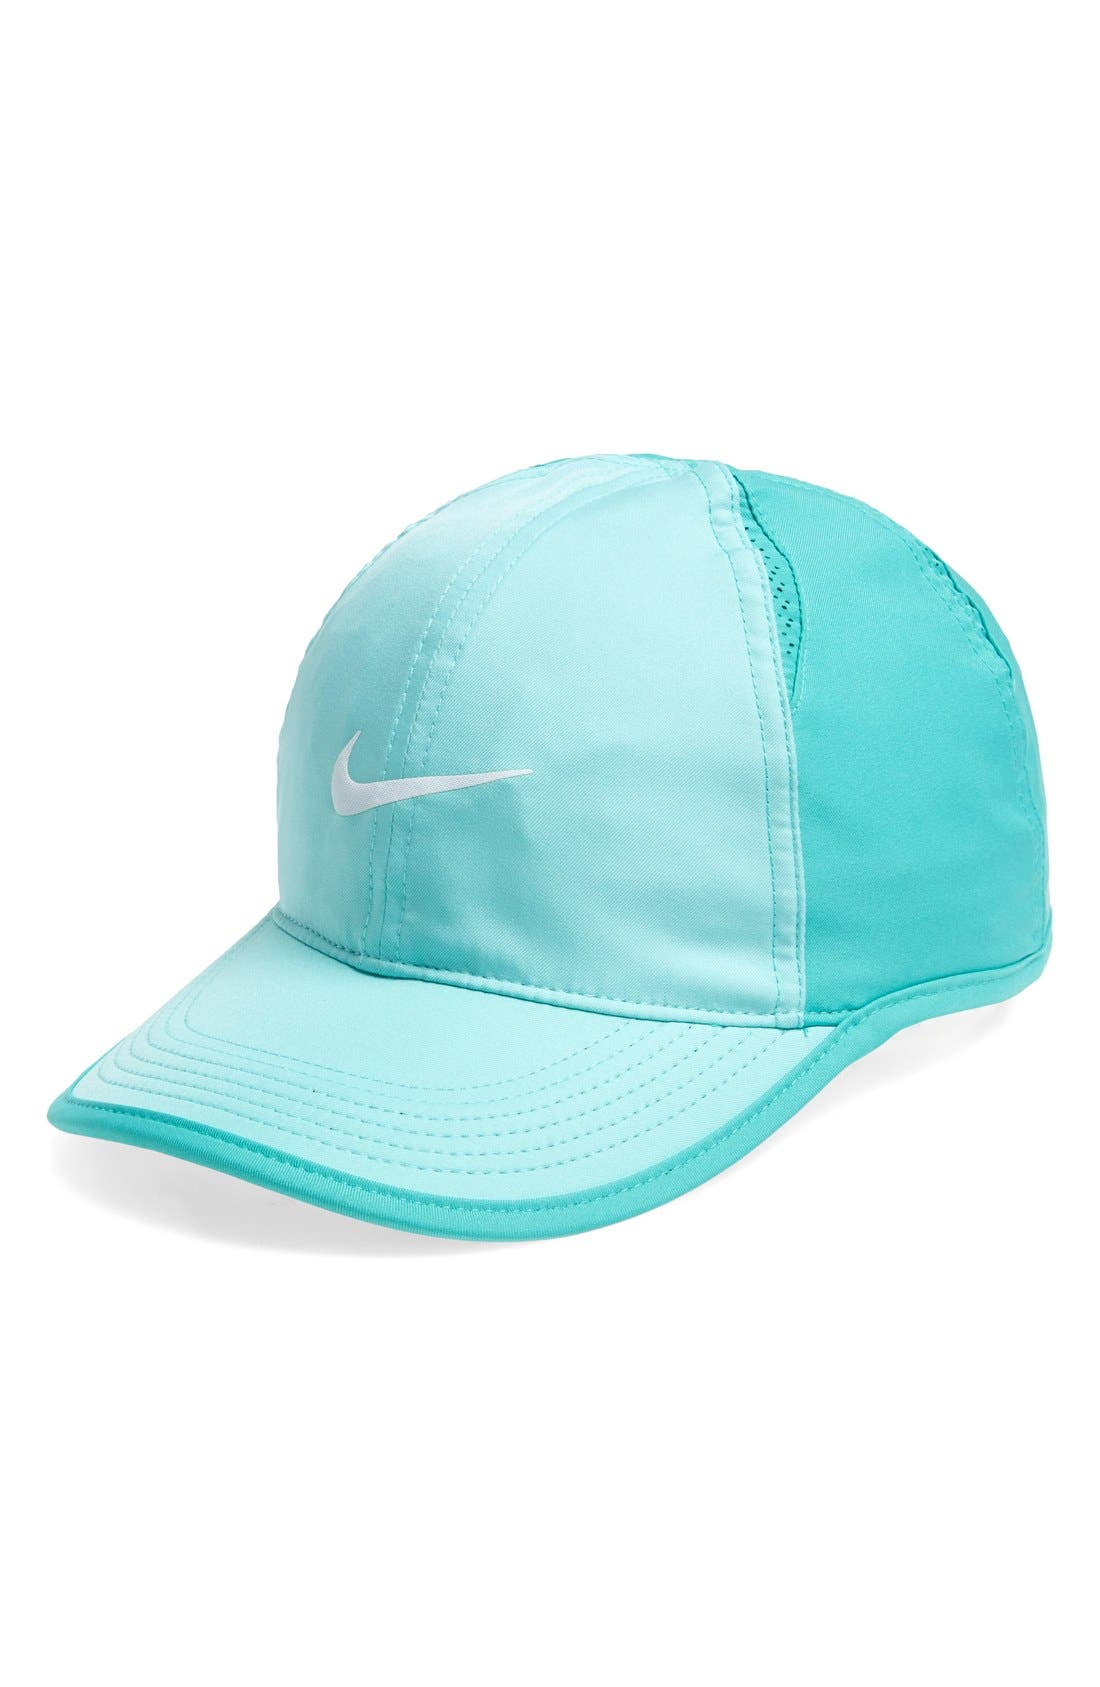 Alternate Image 1 Selected - Nike 'Feather Light' Dri-FIT Cap